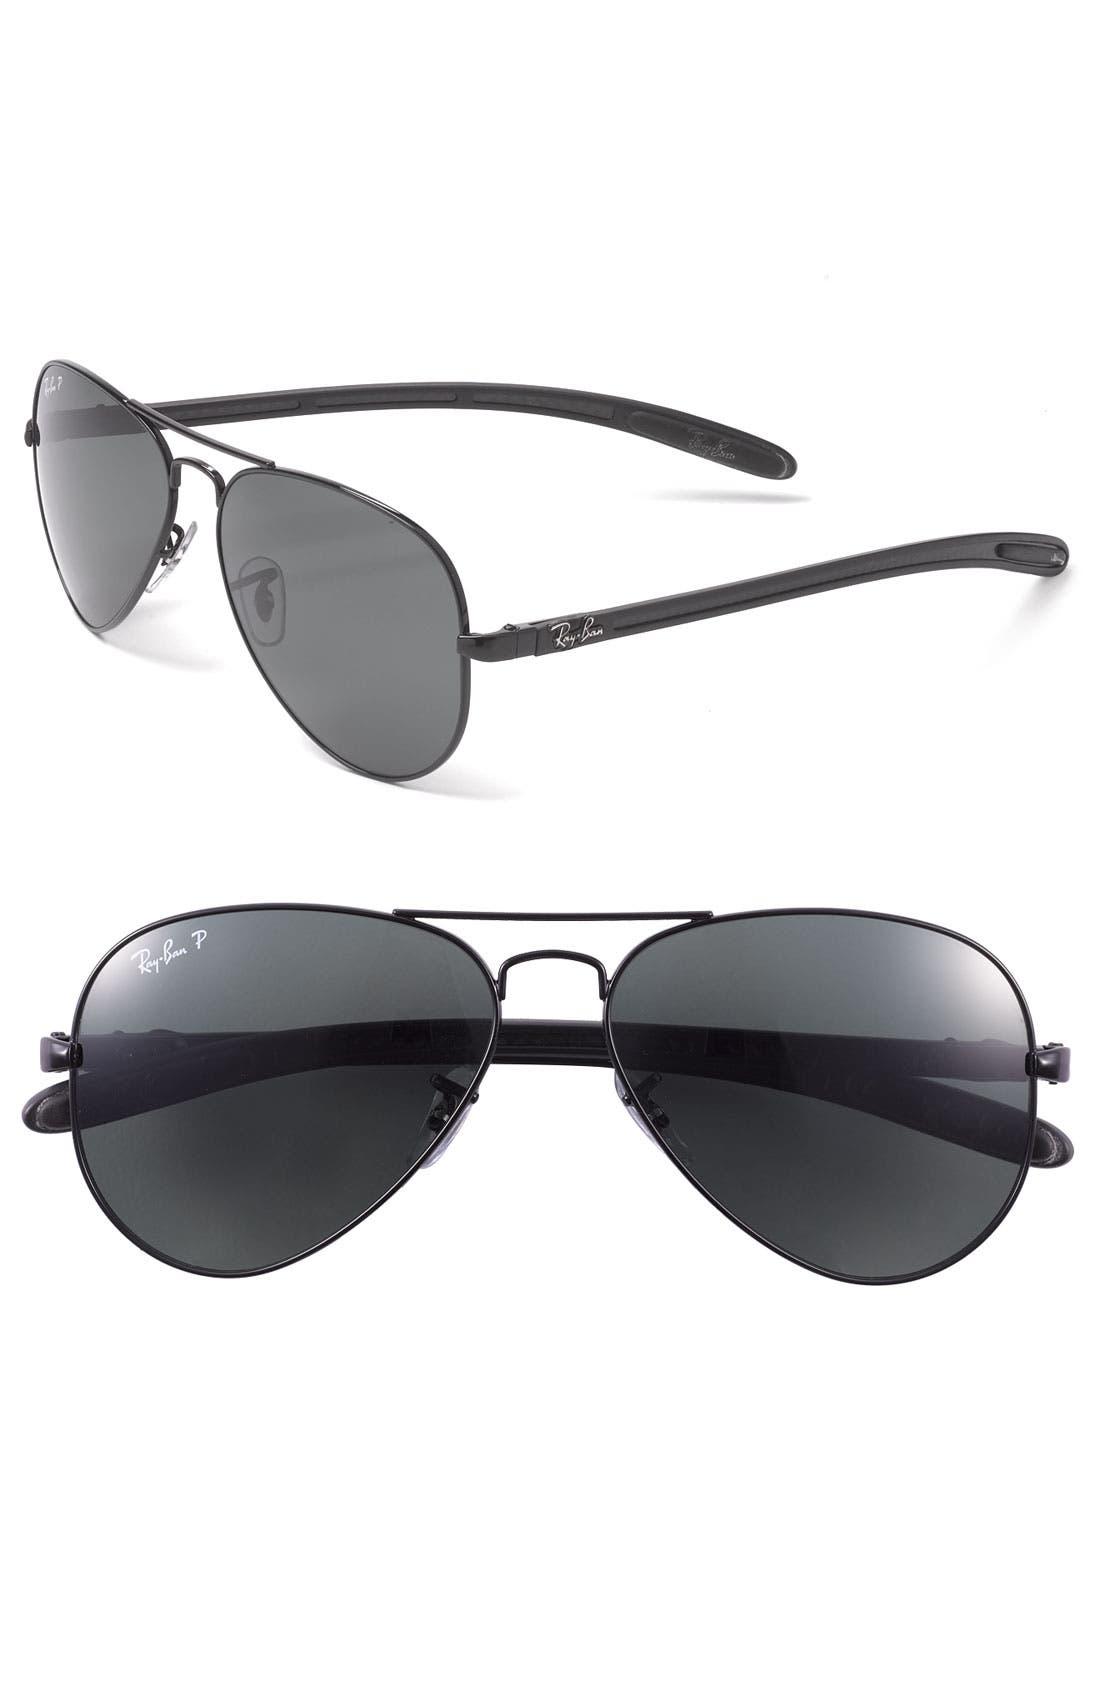 Alternate Image 1 Selected - Ray-Ban 'Tech' Polarized 58mm Aviator Sunglasses